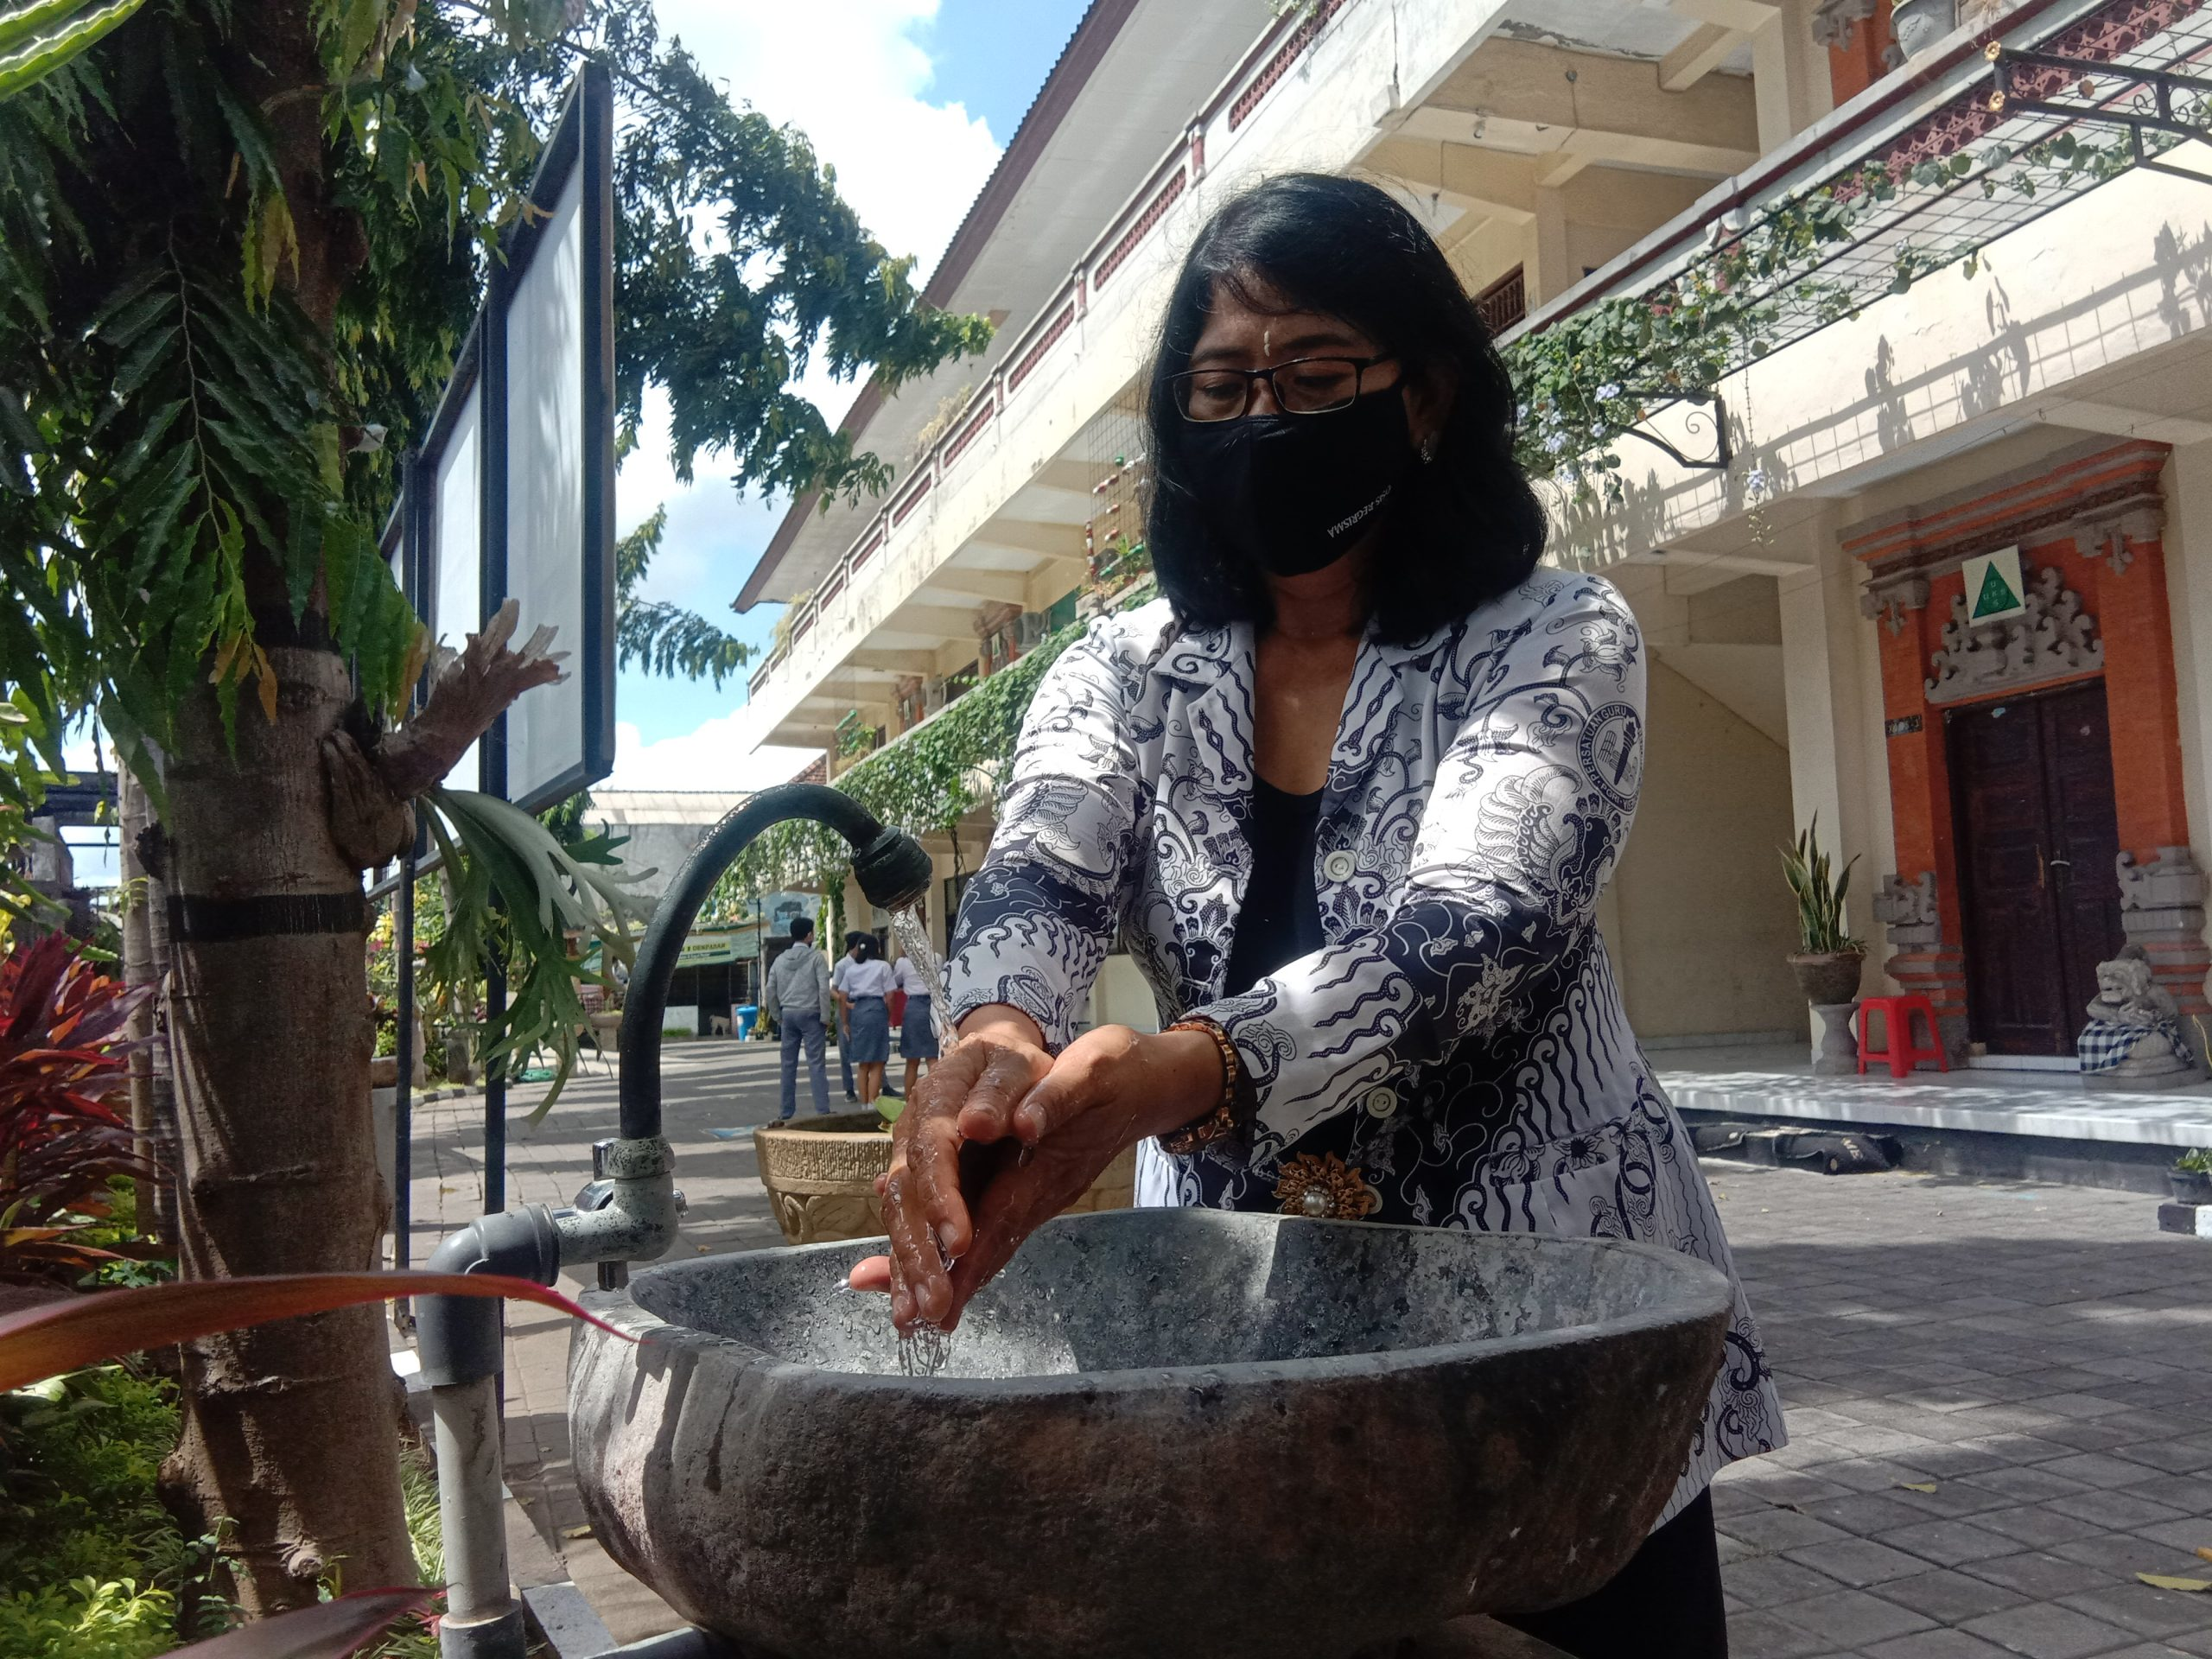 WAKASEK Humas SMA PGRI 2 Denpasar, AA Ayu Seriati tampak mencuci tangan dengan sabun dan membilasnya di air yang mengalir. Foto: alt